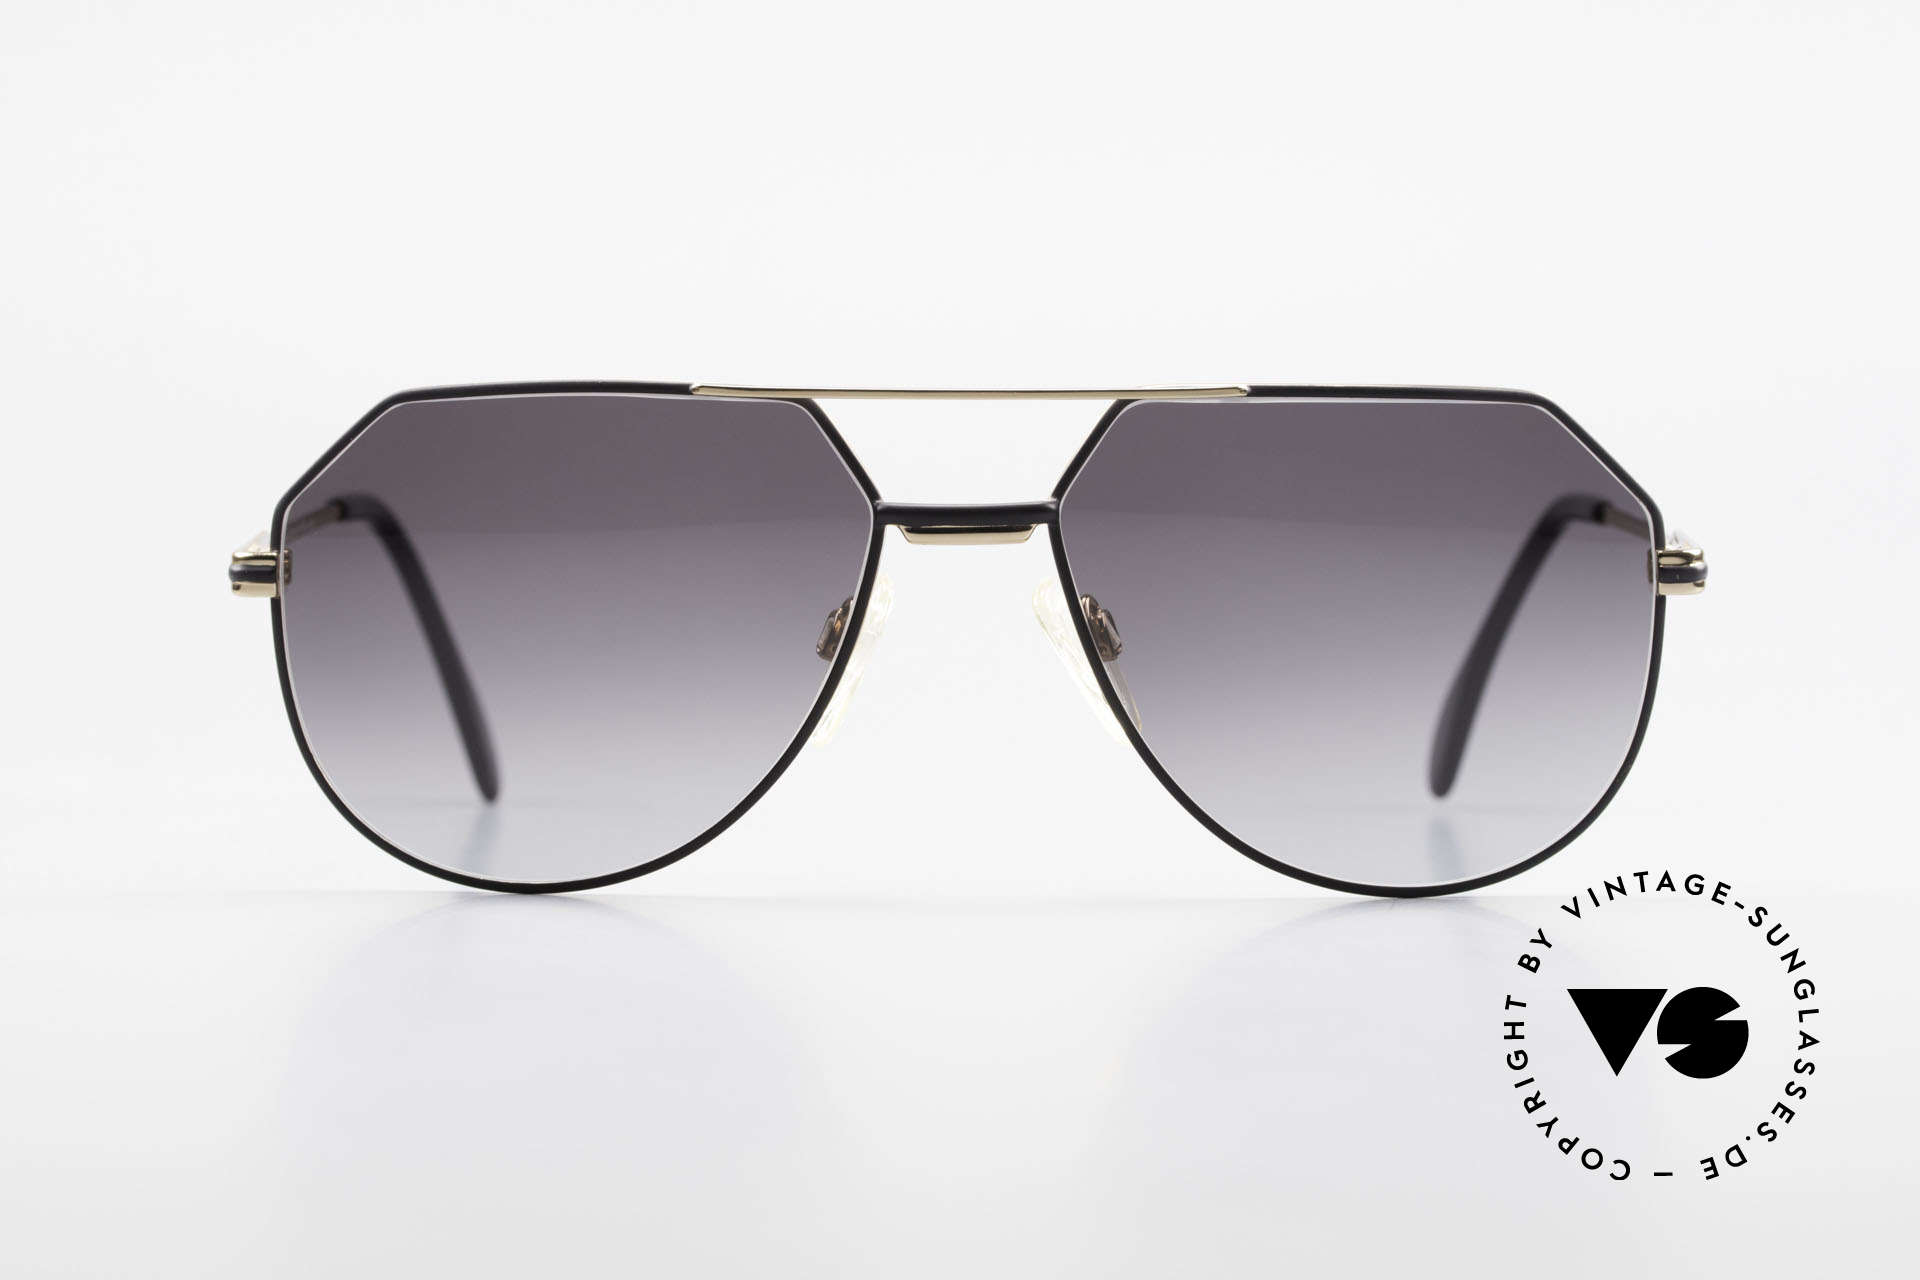 Cazal 724 West Germany Titan Cazal 80's, titanium designer frame for men by Mr. CAri ZALloni, Made for Men